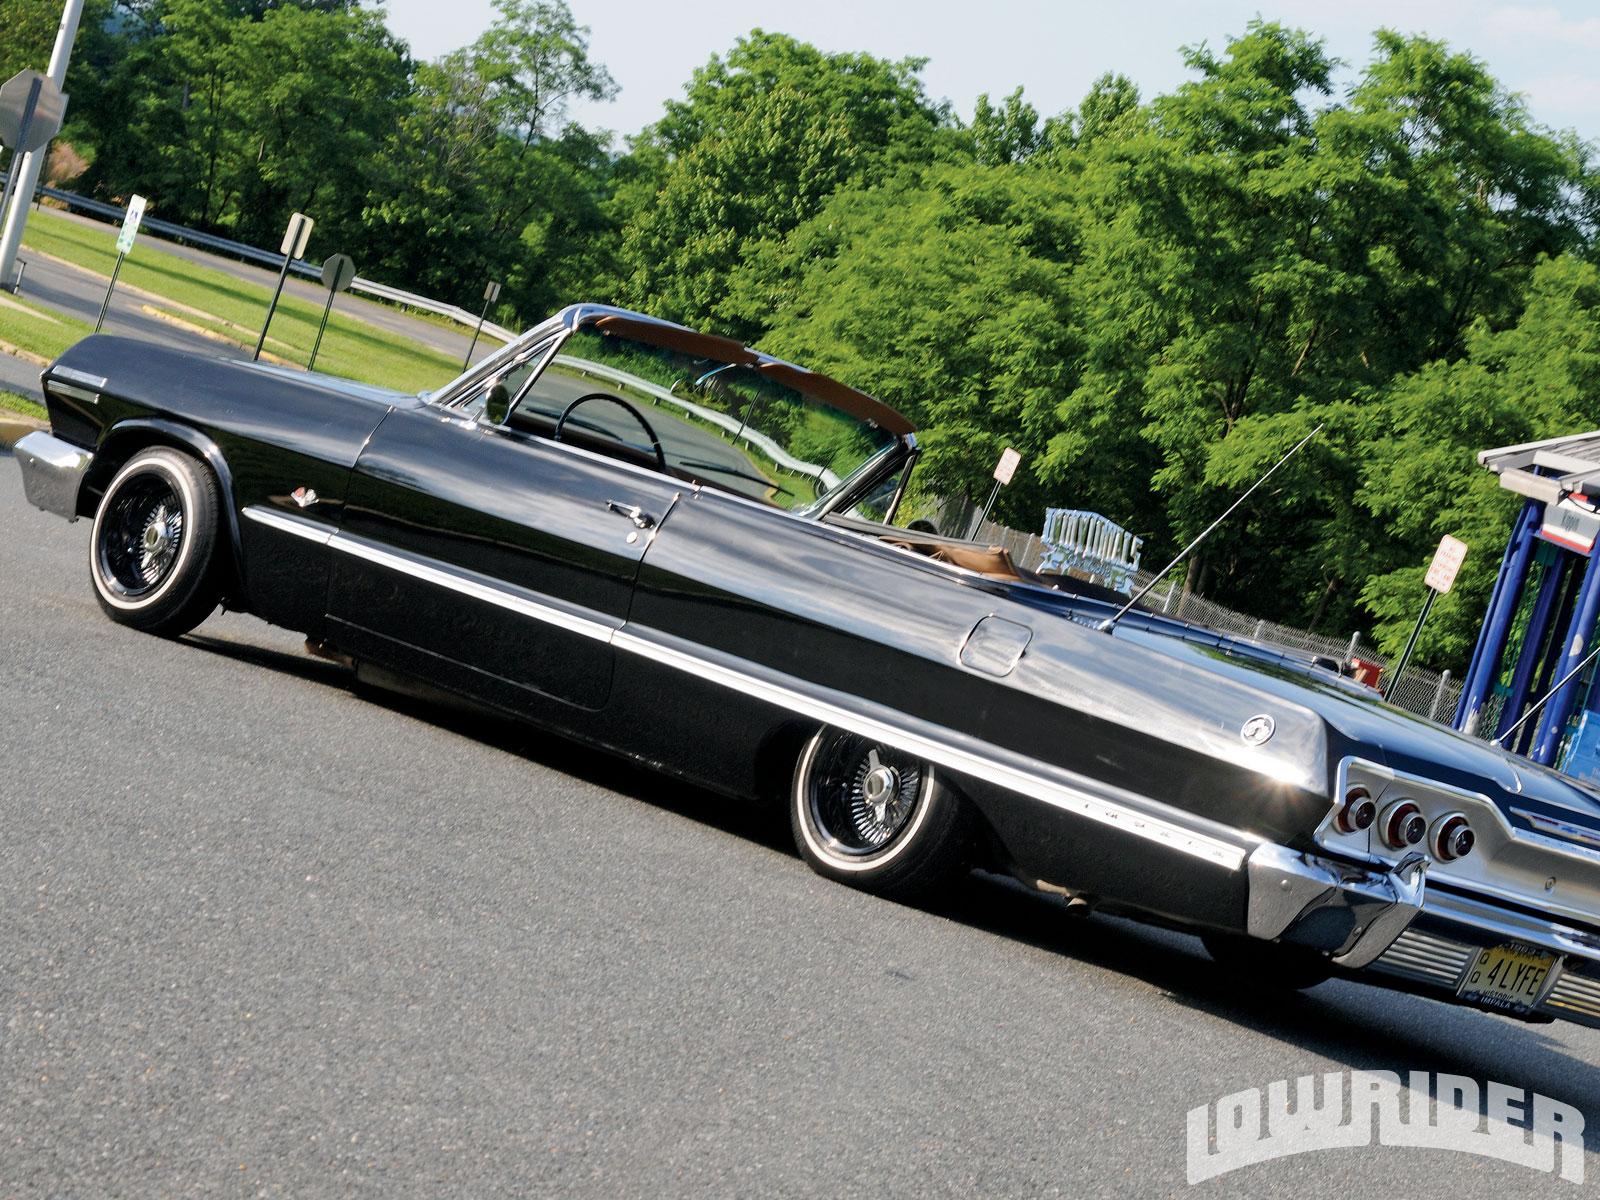 Texas Edition Wheels >> 1963 Chevrolet Impala SS Convertible - Lowrider Magazine